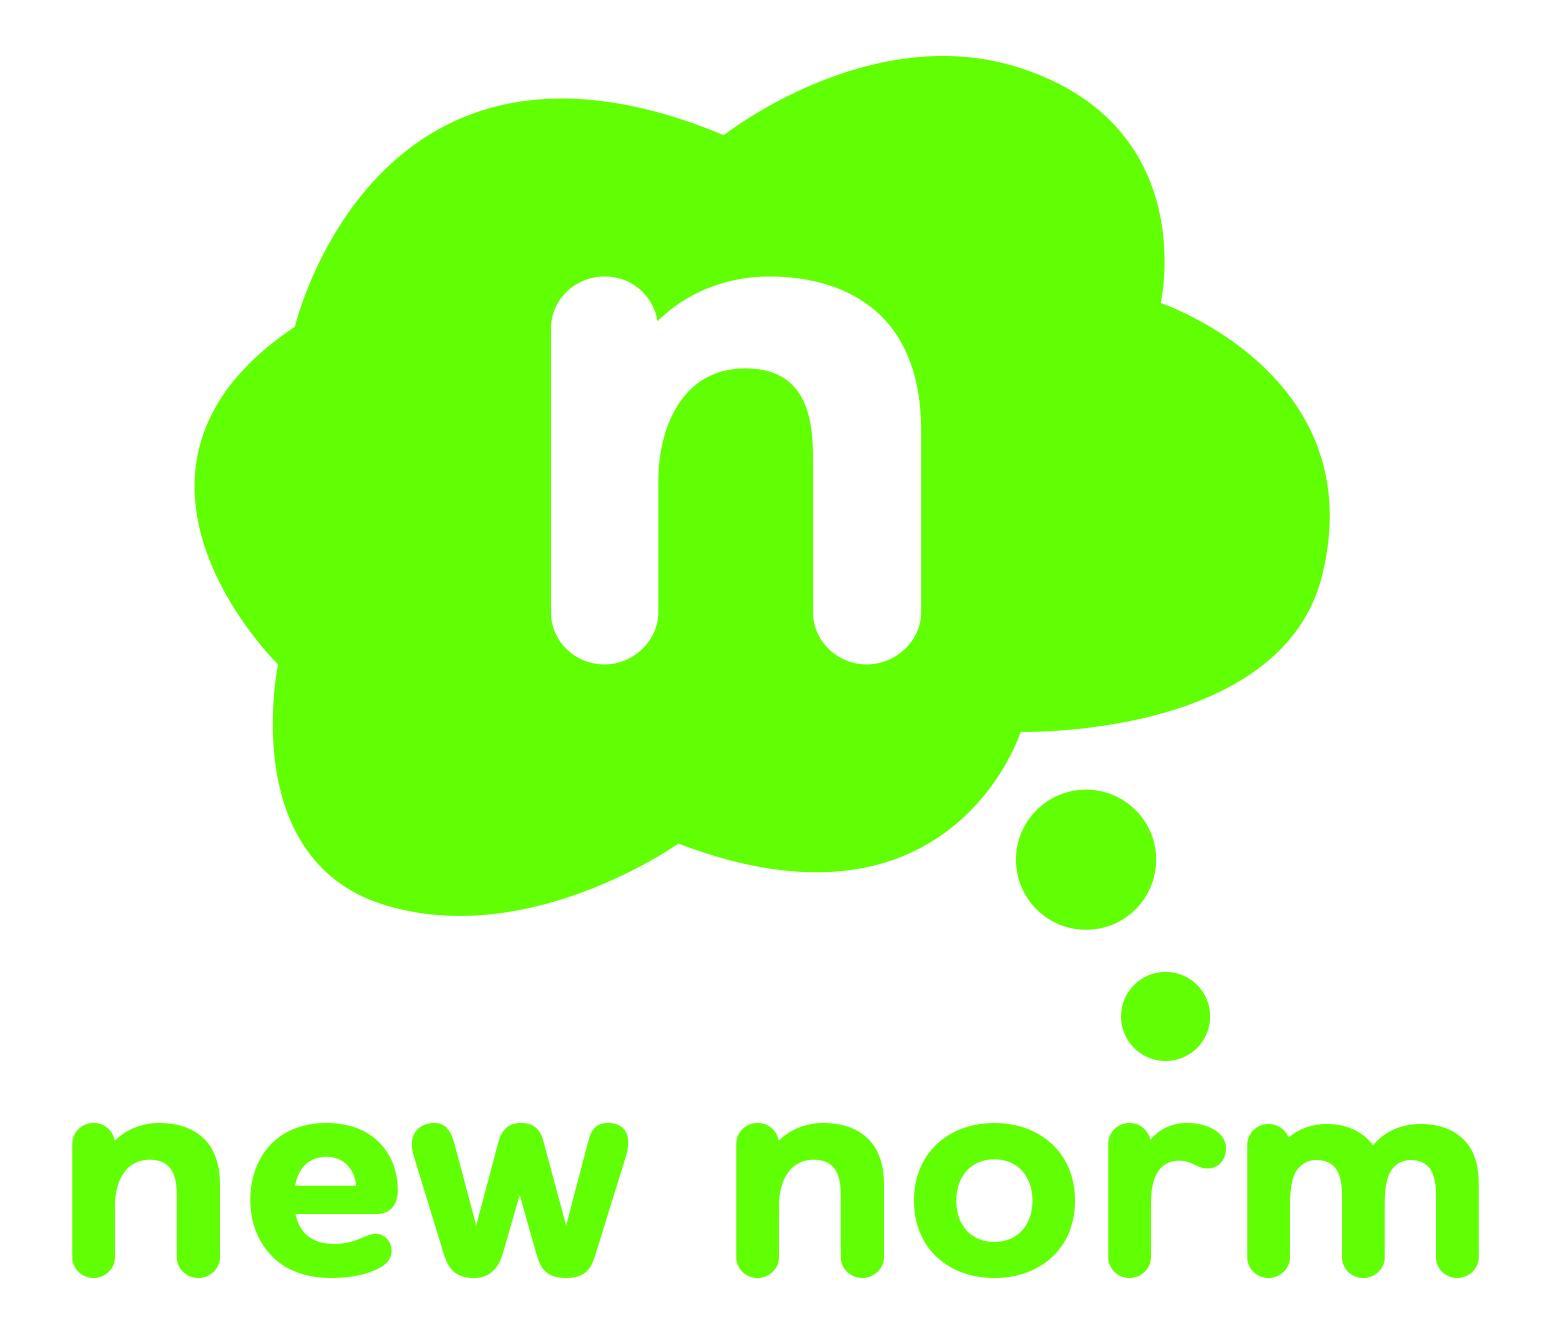 NewNormLogo_FINAL.jpg